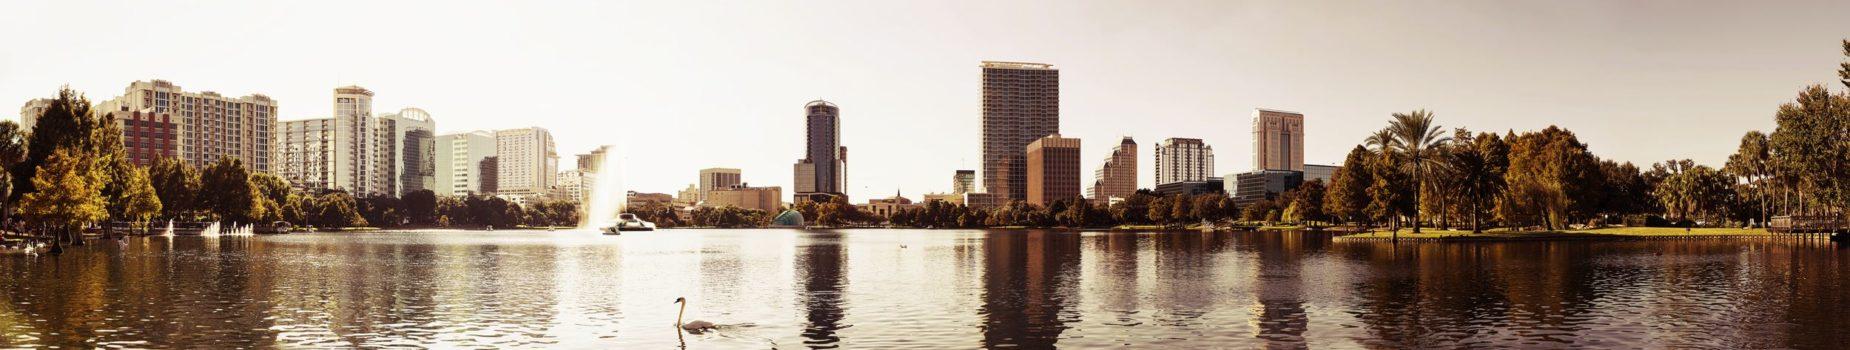 Fly Drive Orlando